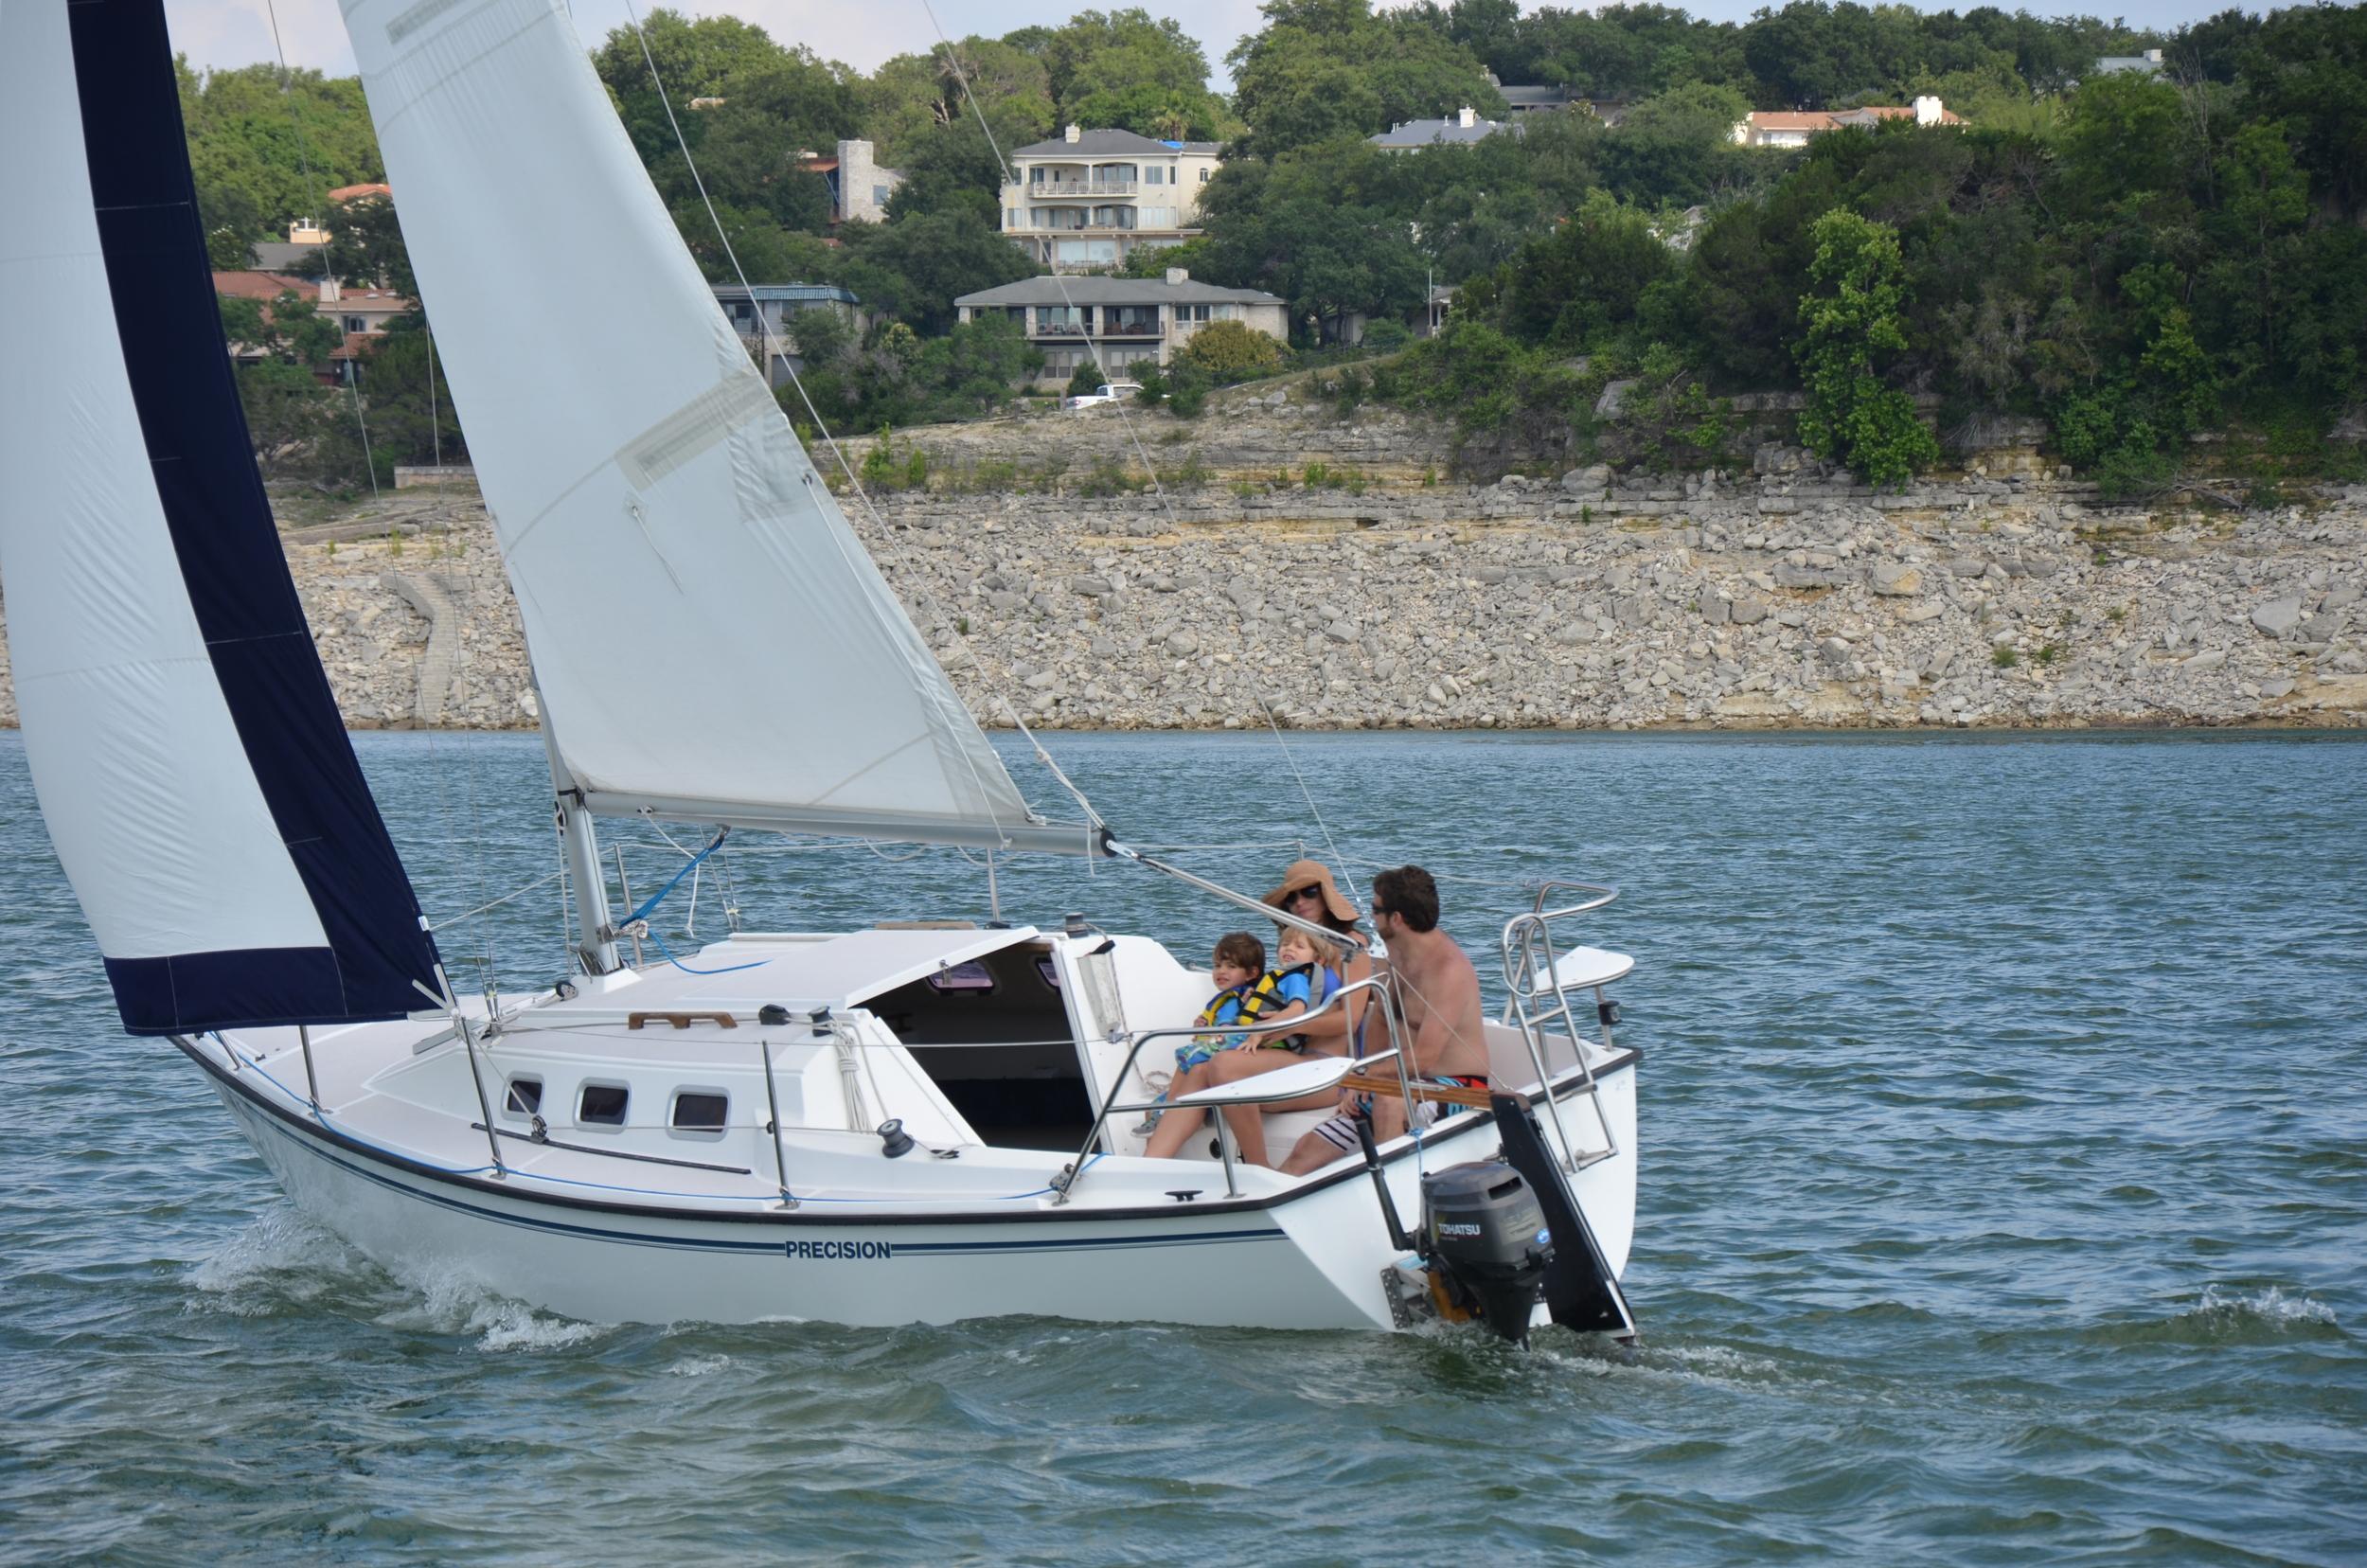 Us sailing certification courses texas sailing us sailing certification courses 1betcityfo Choice Image